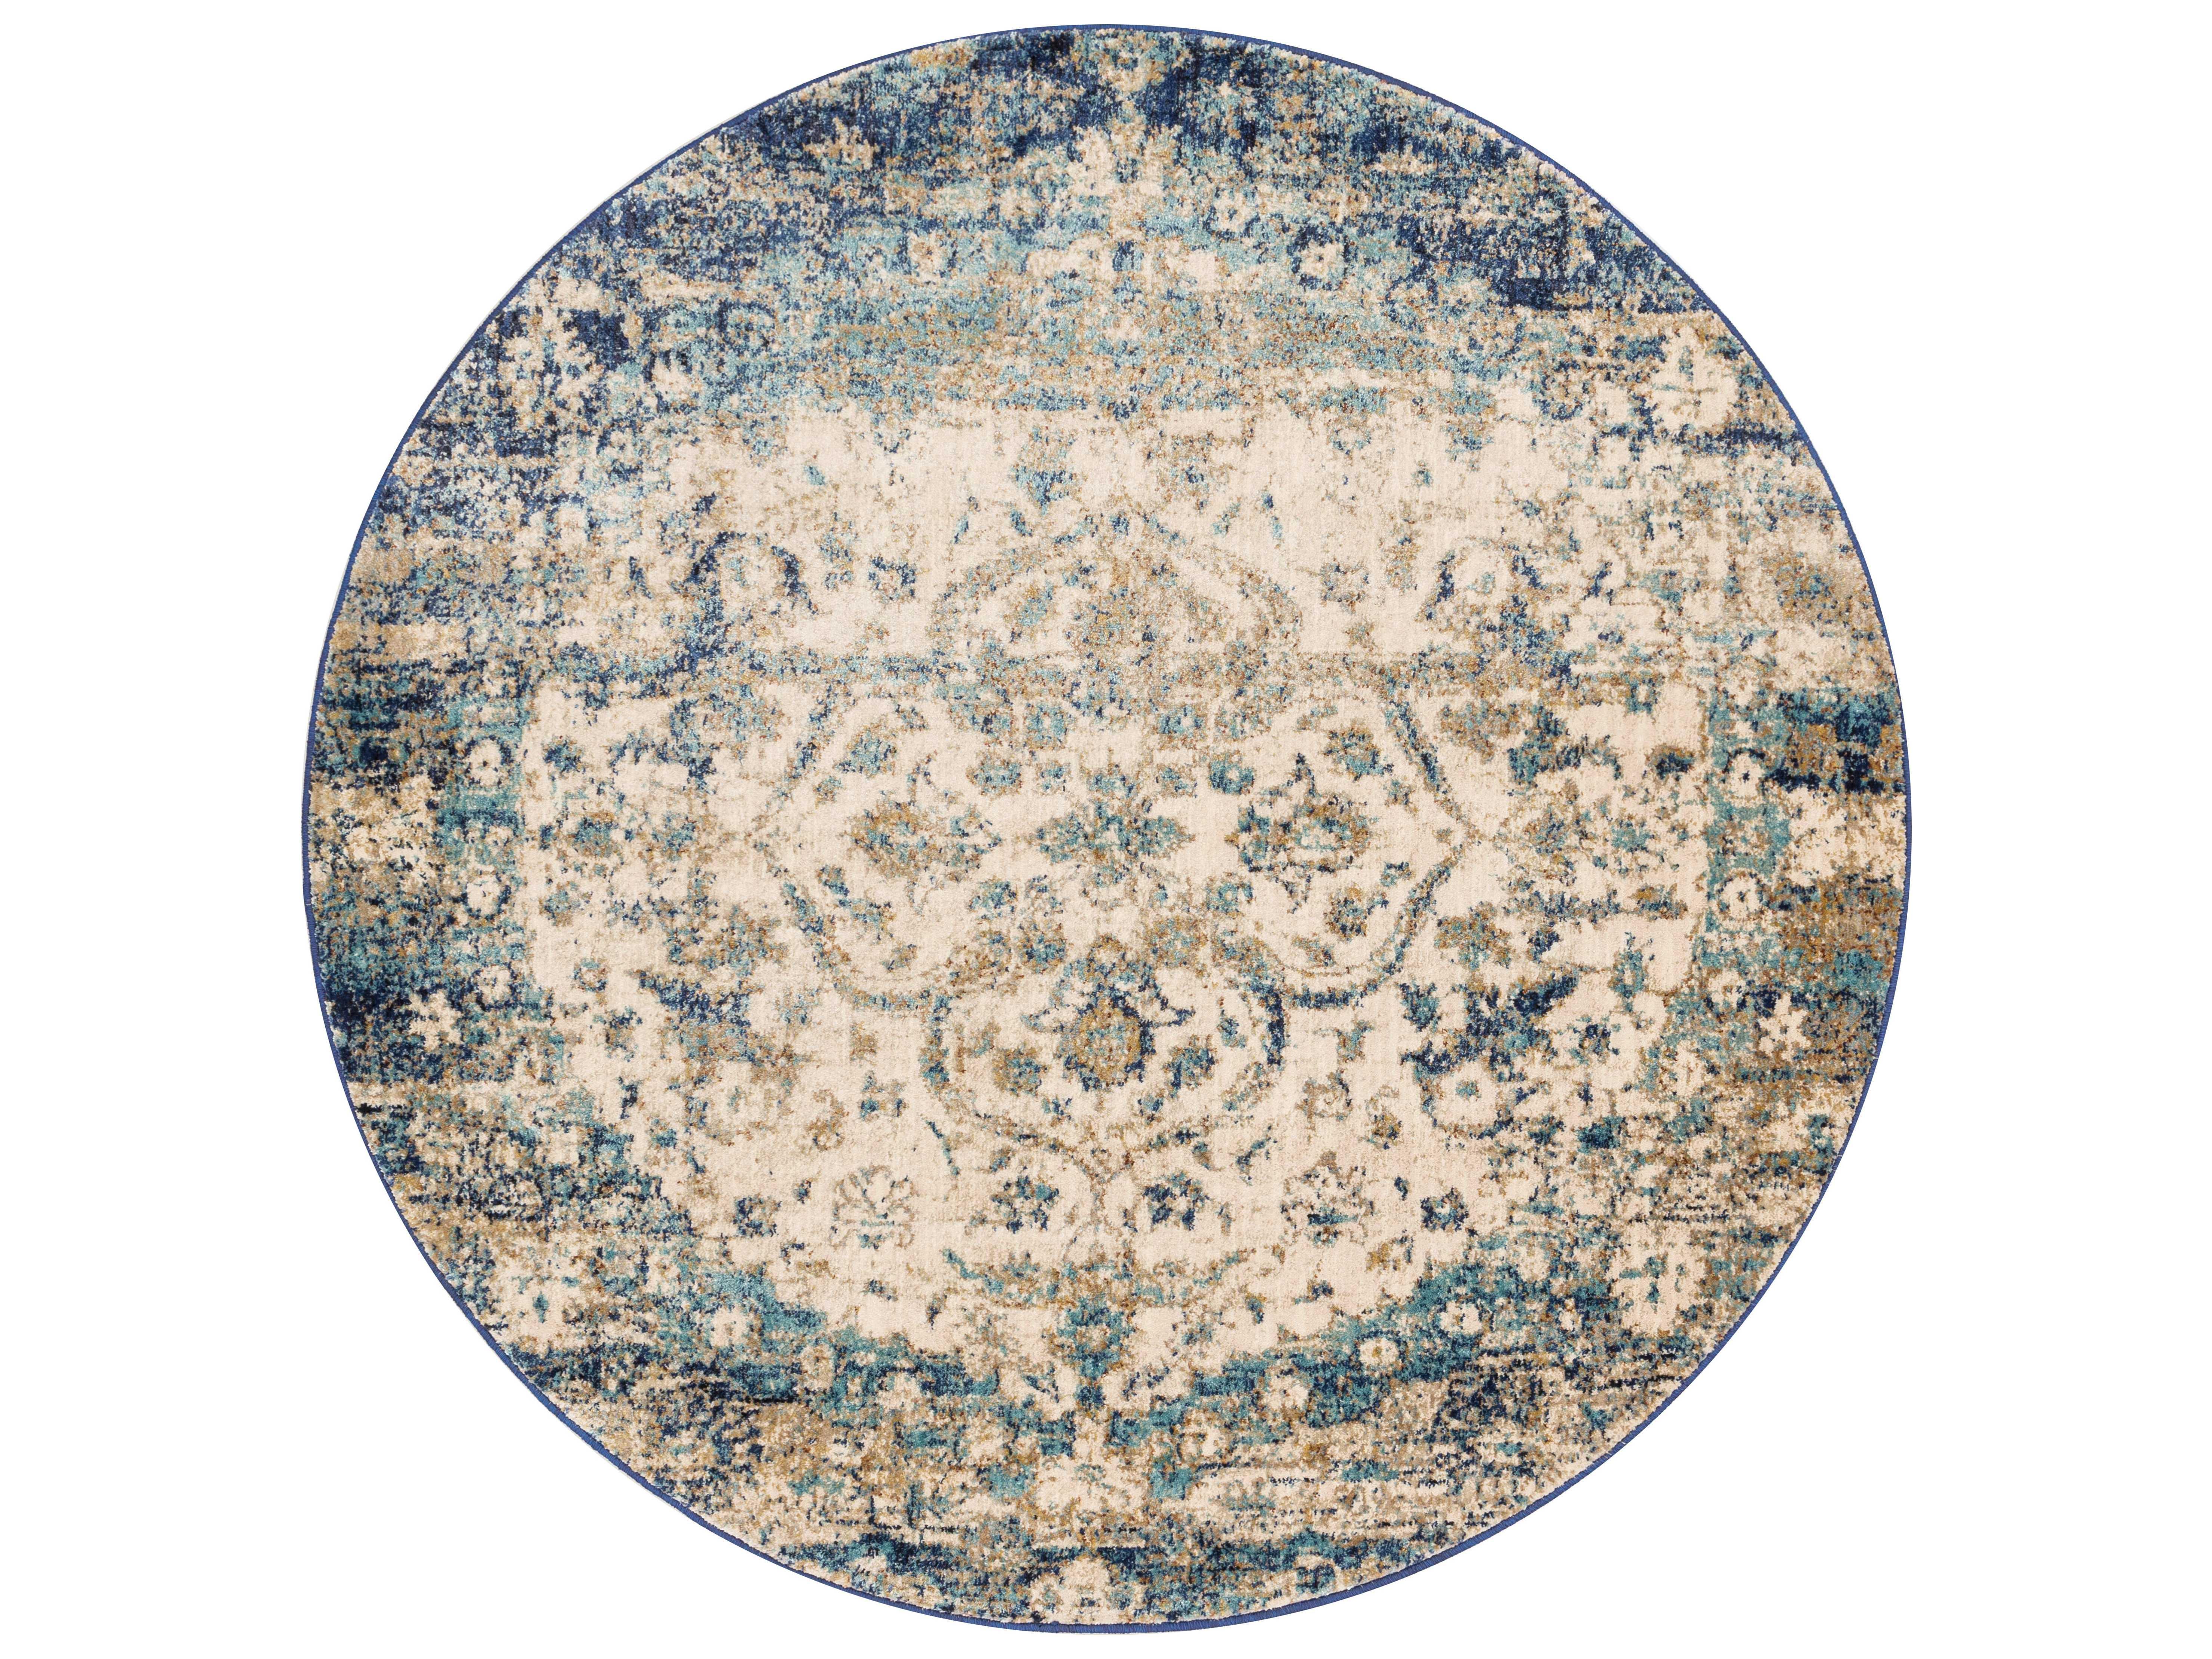 walmart dark elegance scrollwork safavieh round rugs com acdb ip area rug shag florida grey